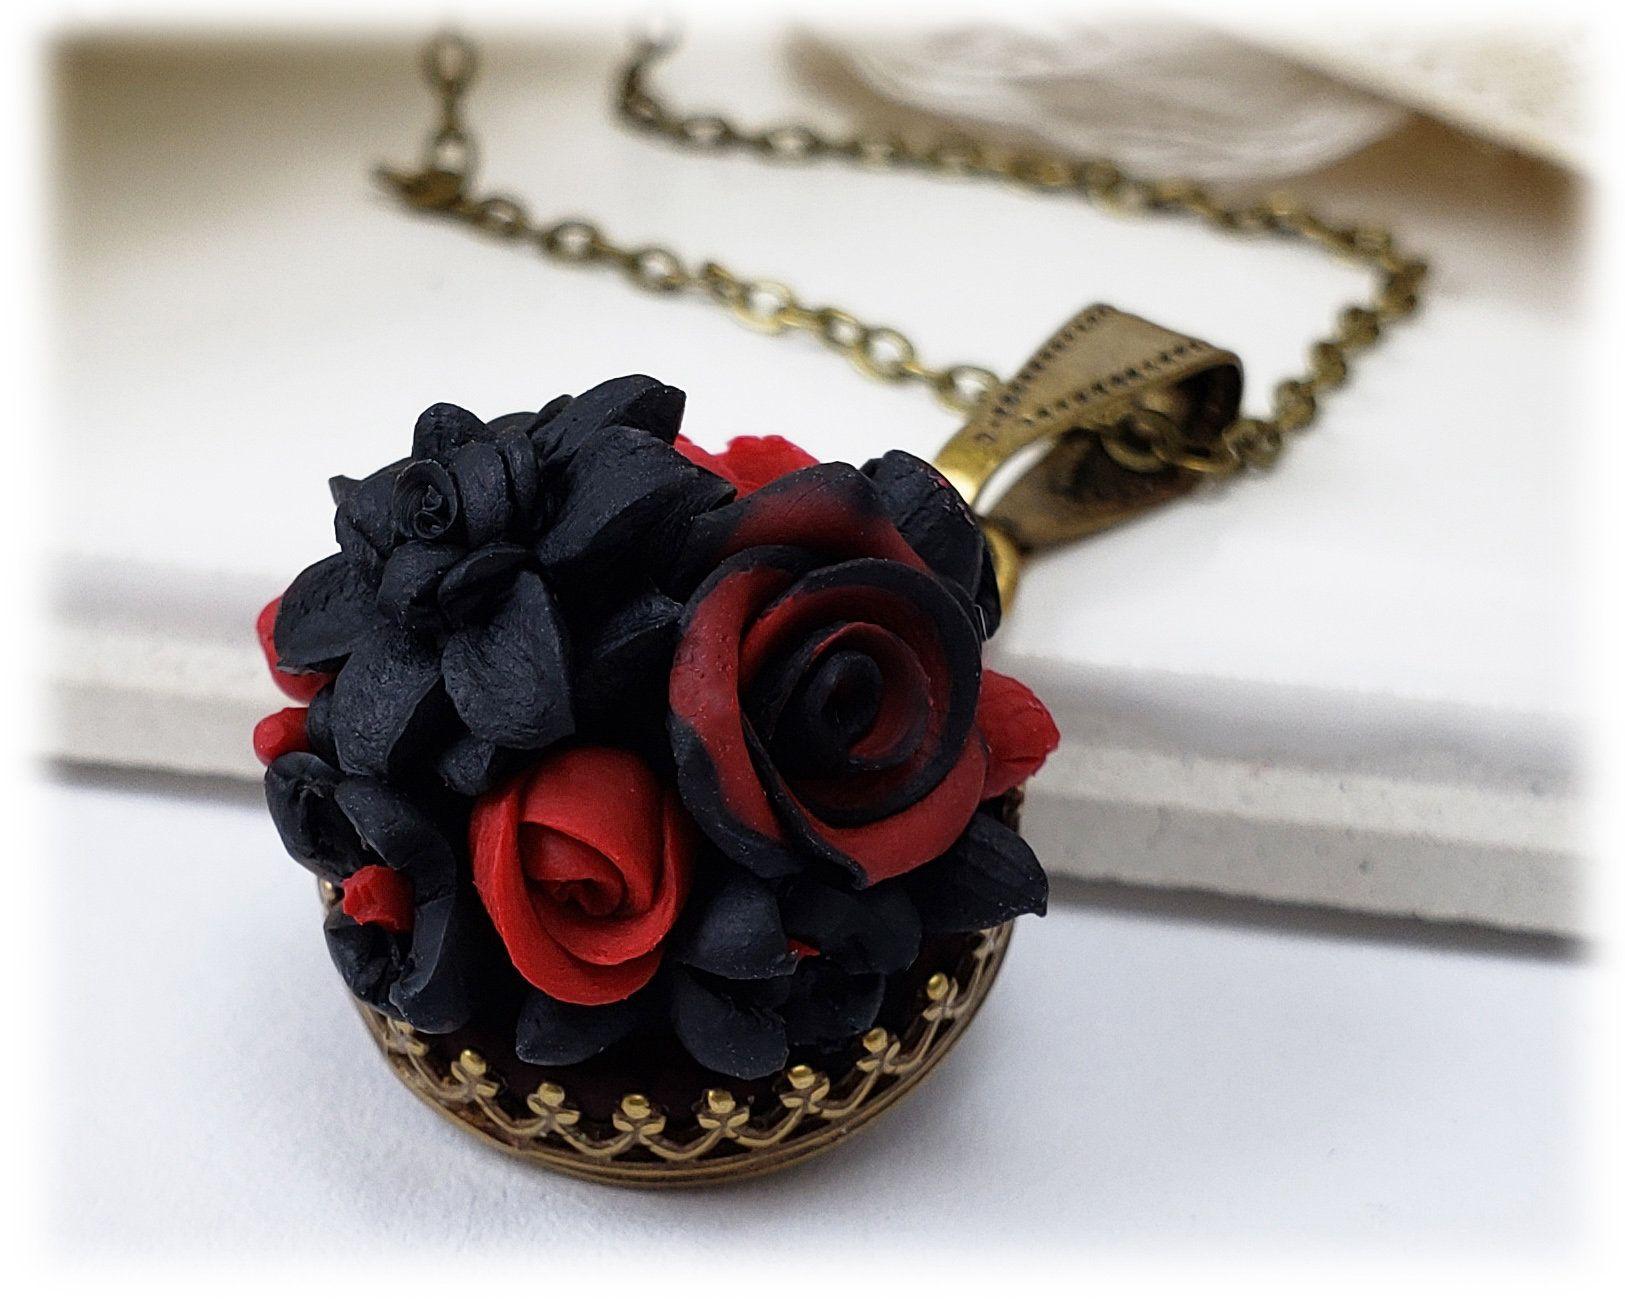 Rose Black Dahlia Necklace Black Flower Necklace, Black